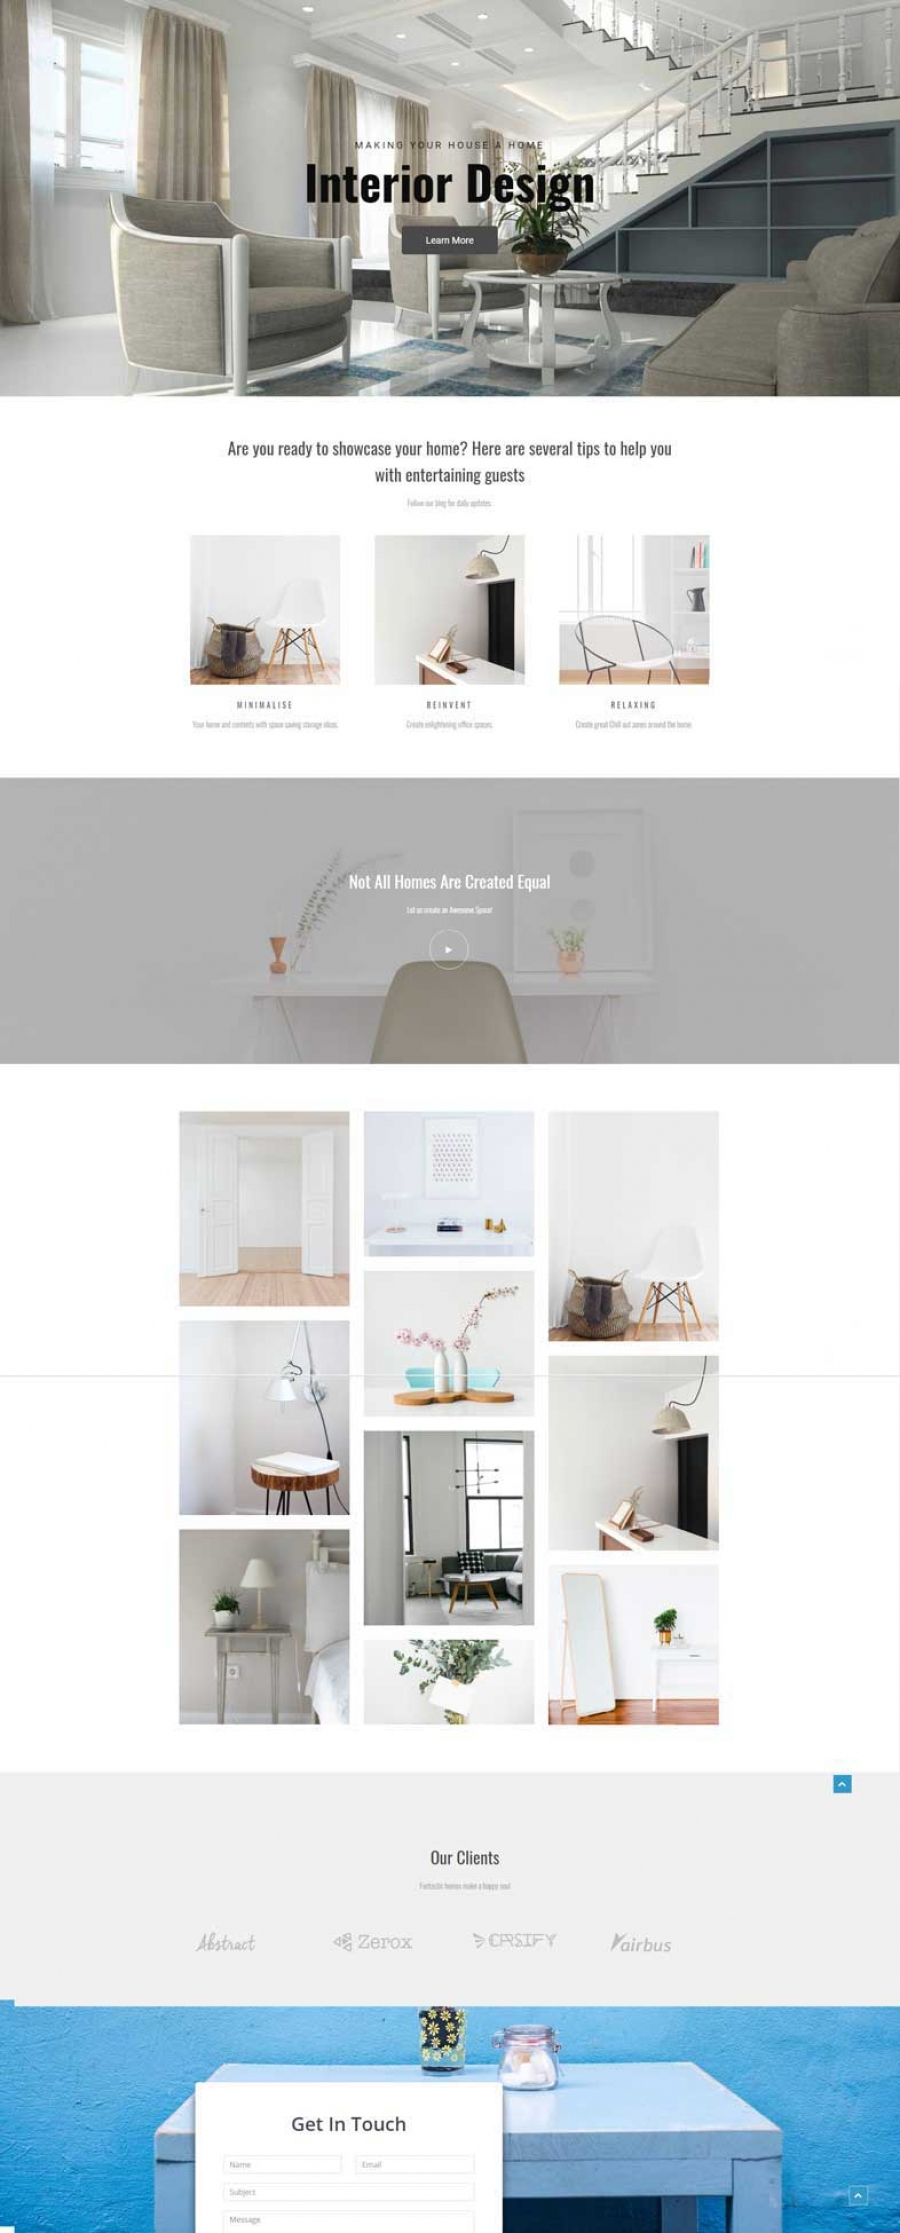 Web Design Ideal For An Interior Designer